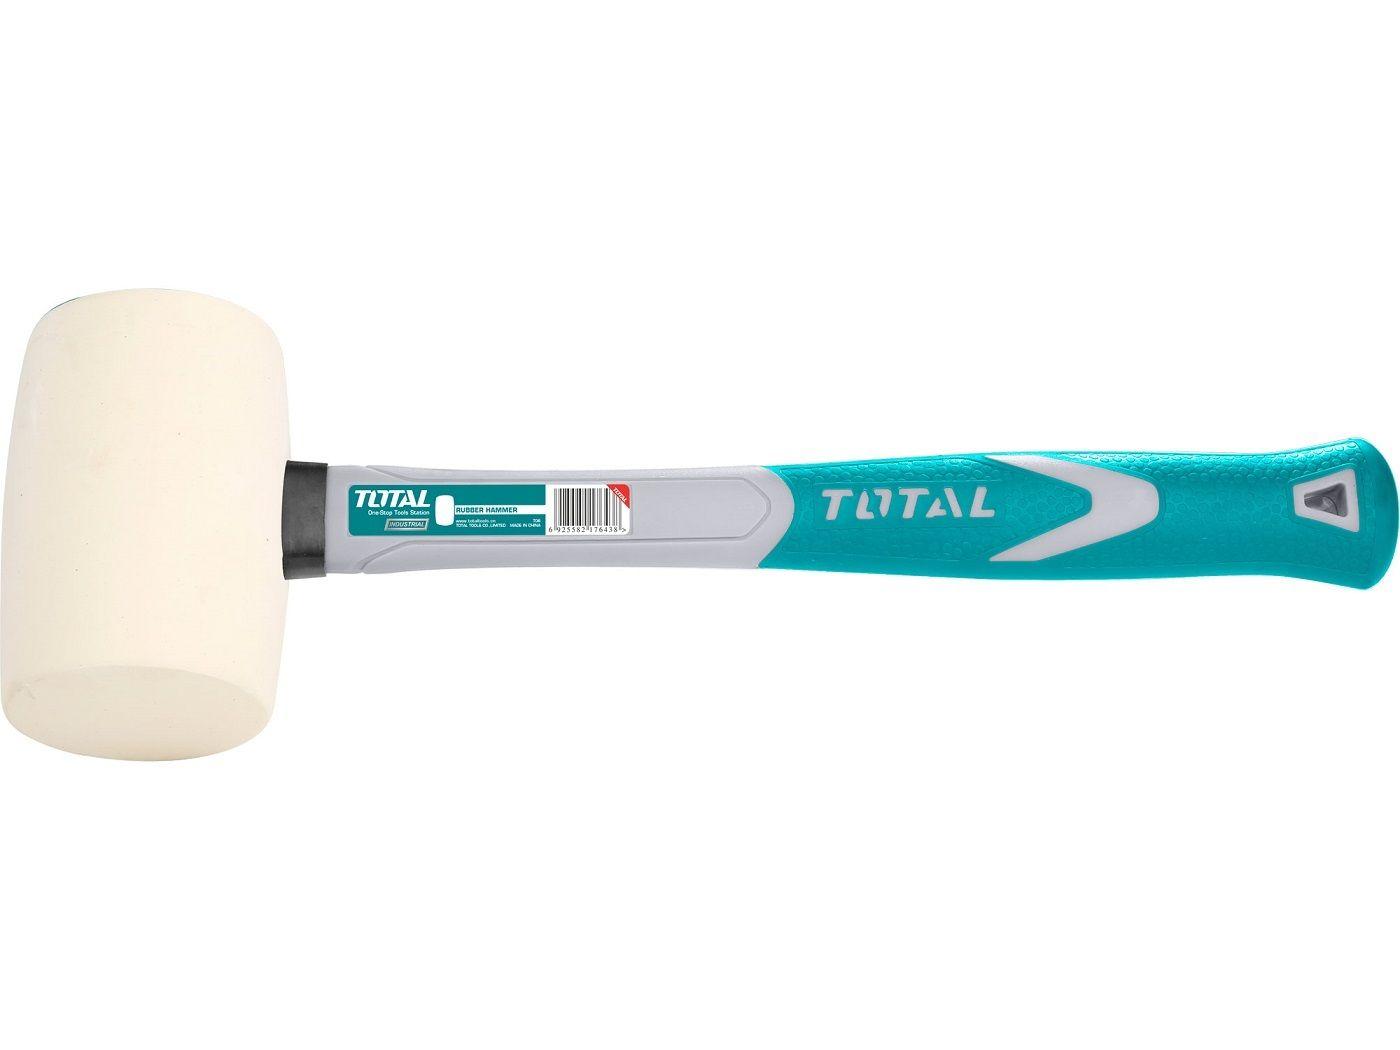 Palička pryžová bílá, 220g, industrial TOTAL-TOOLS